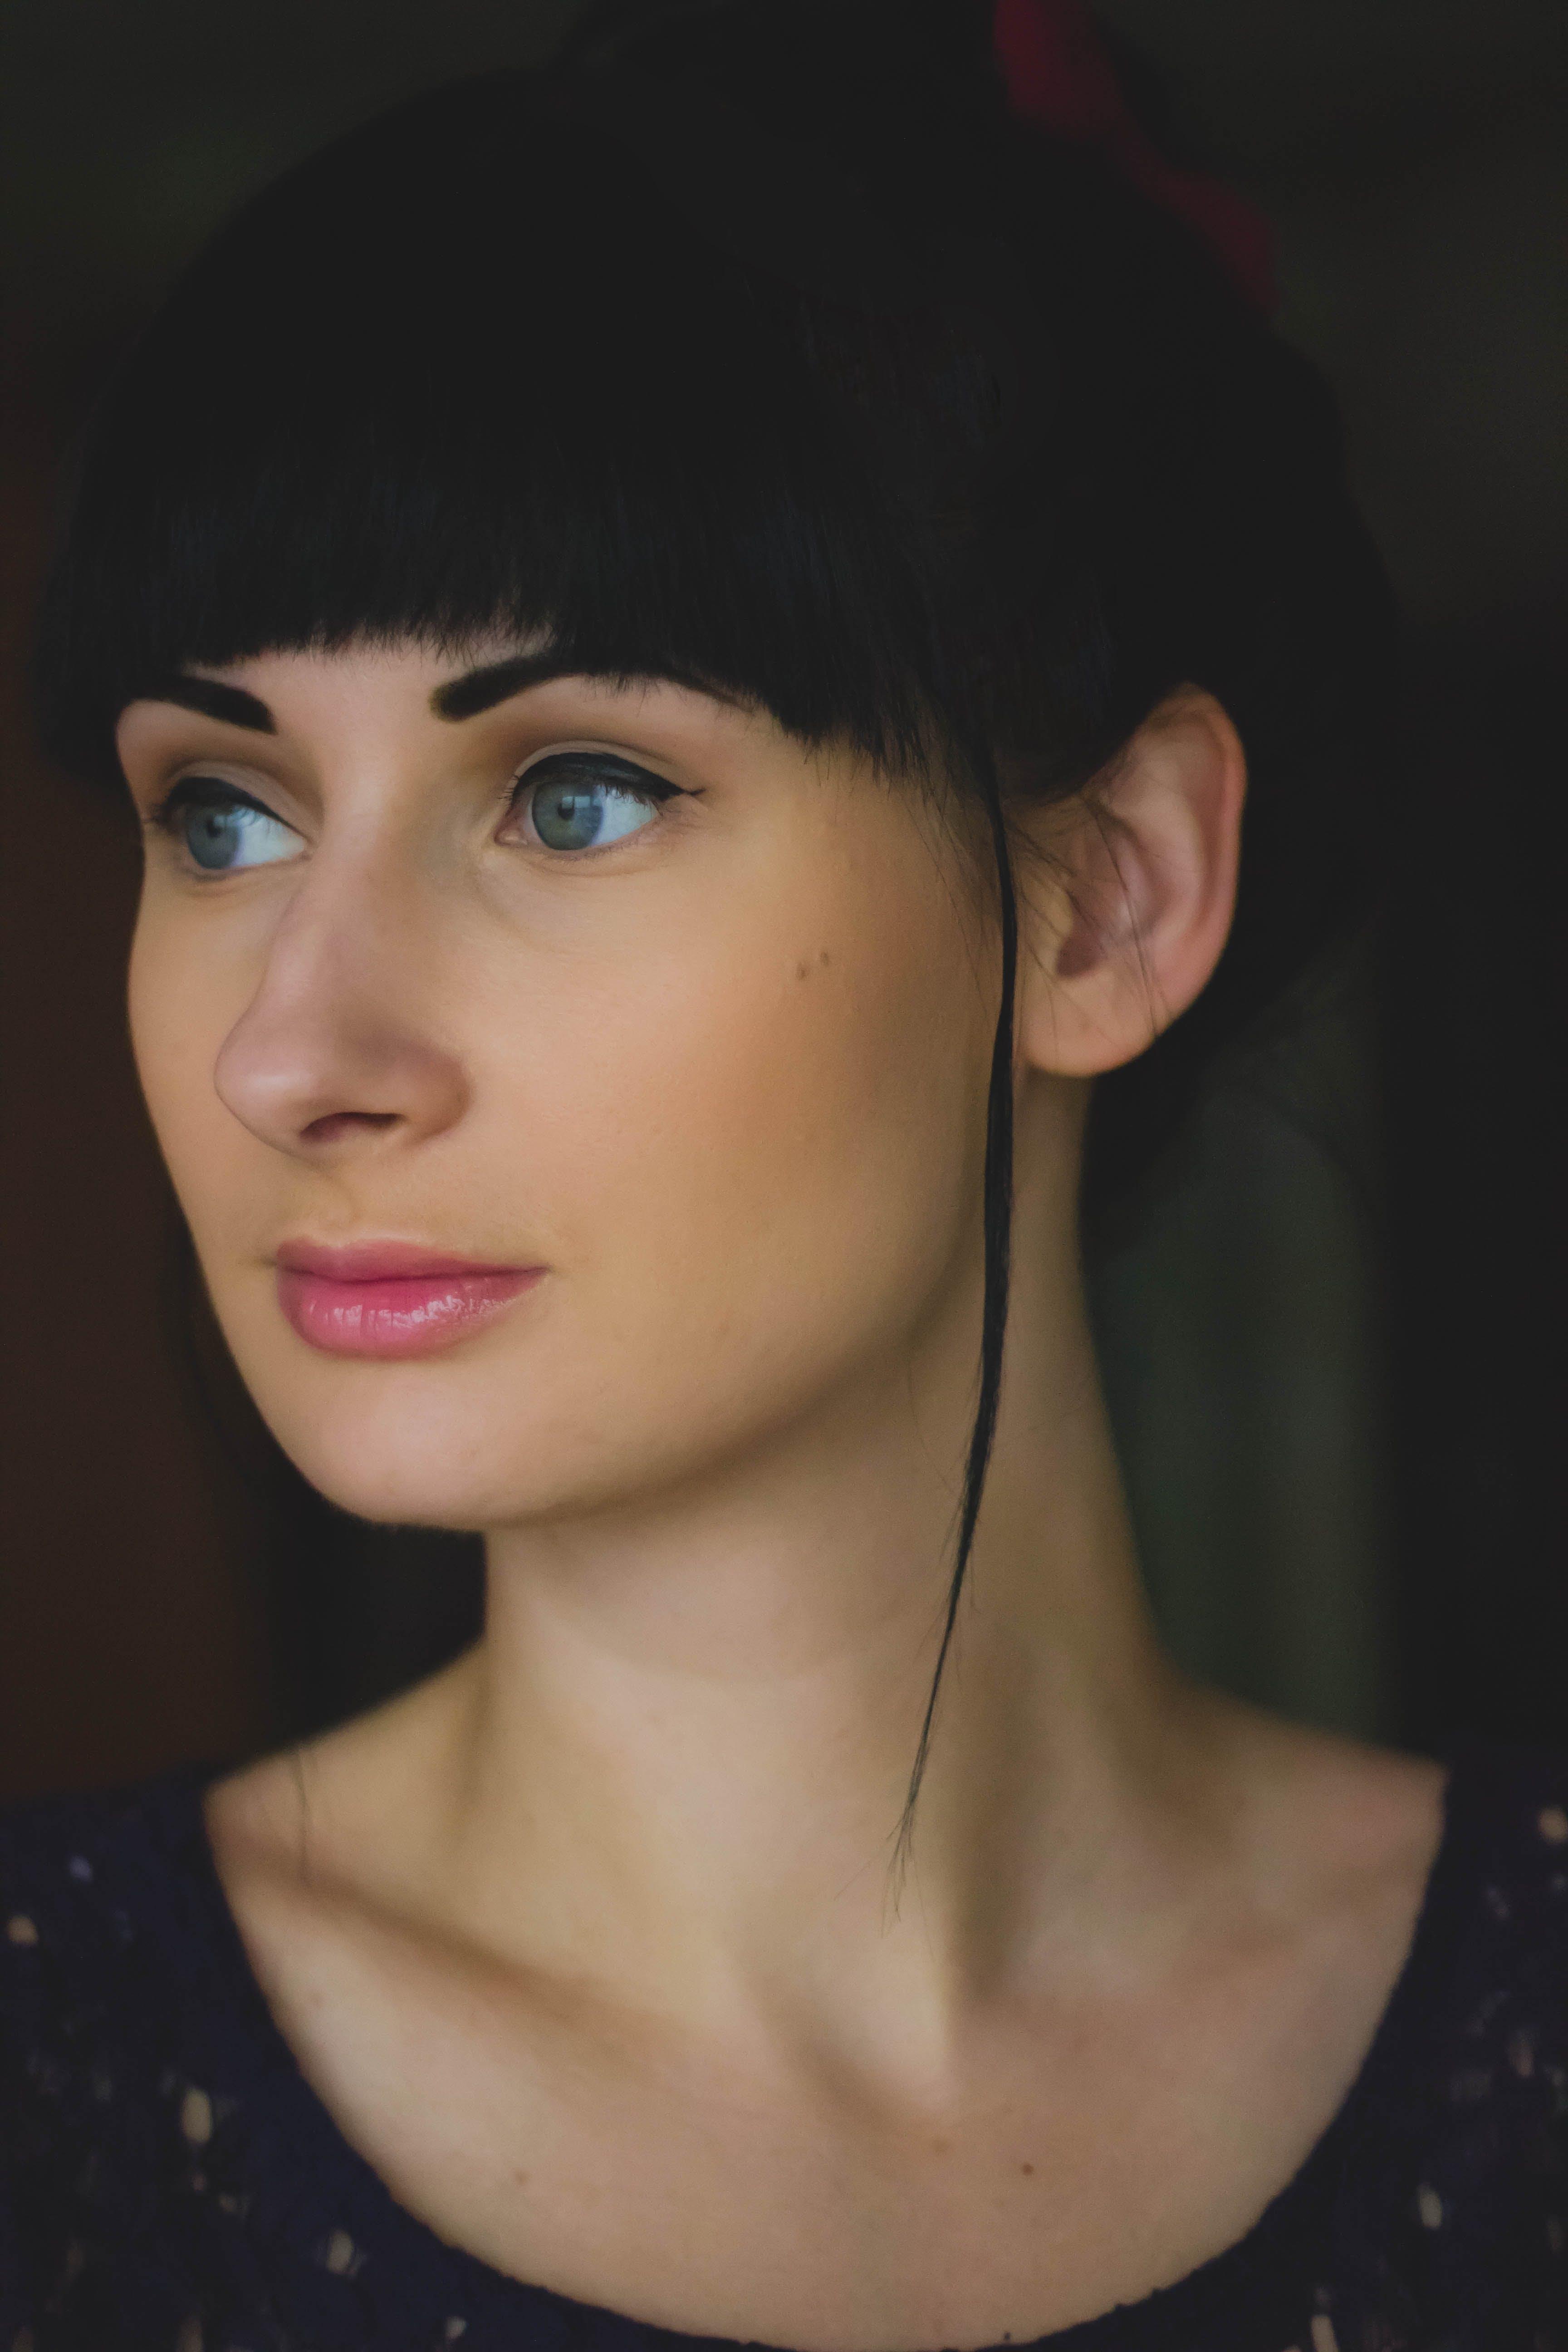 Woman Wearing Black Scoop Neck Shirt